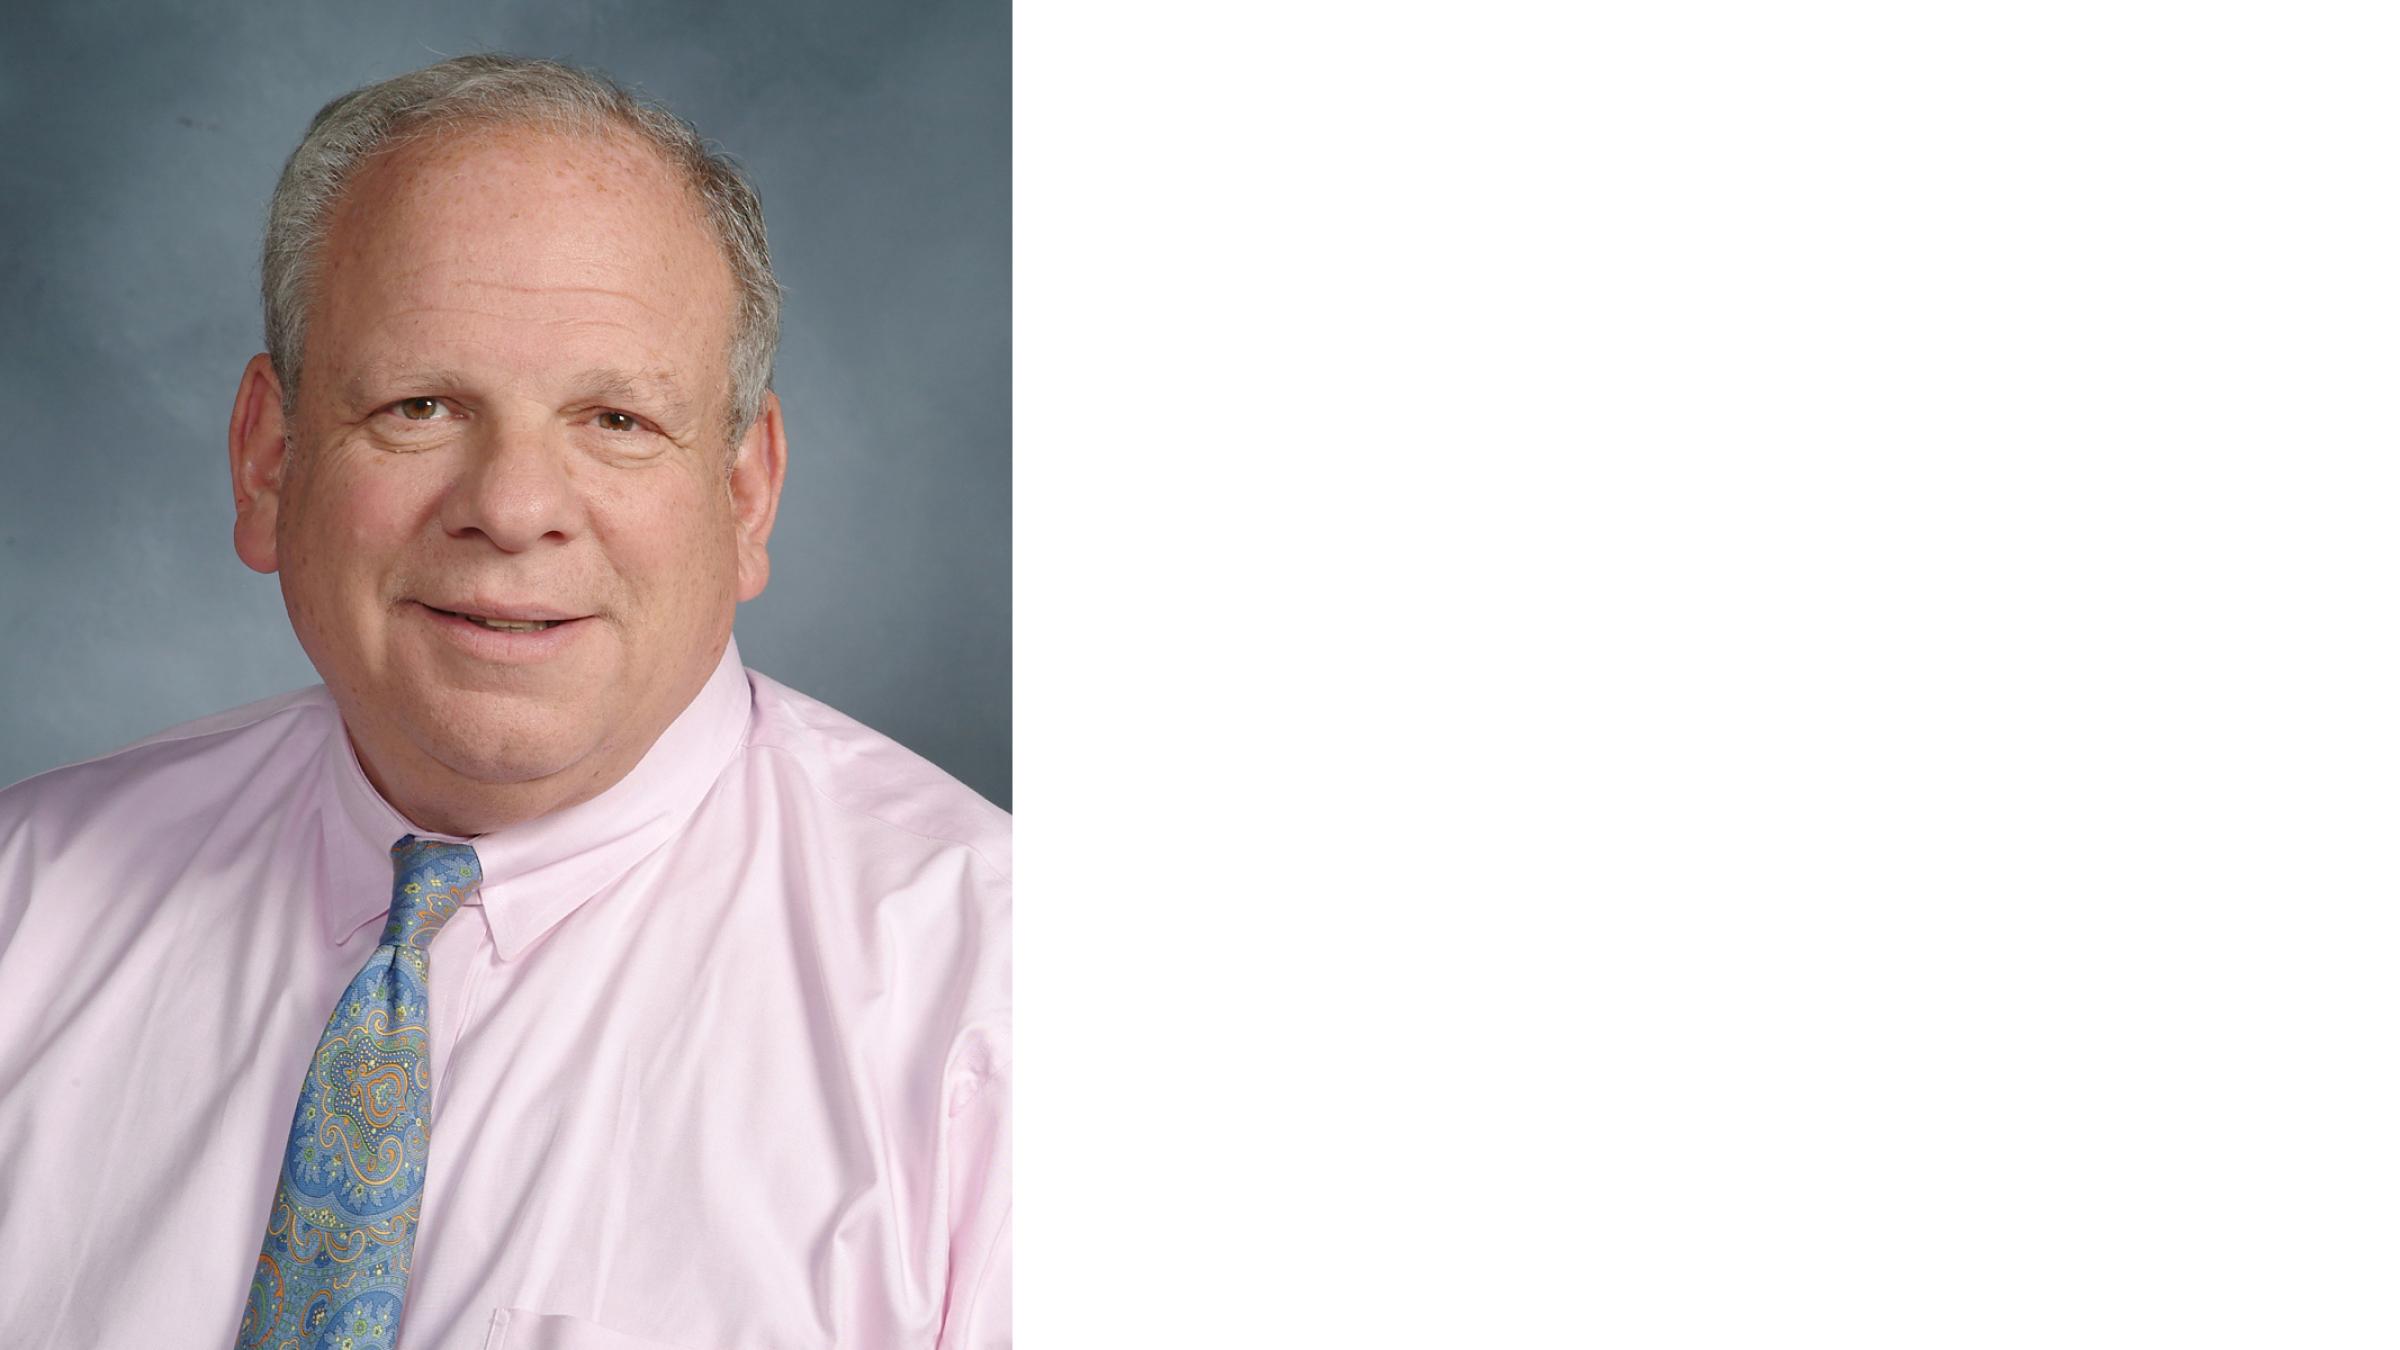 Dr. Stephen Thomas